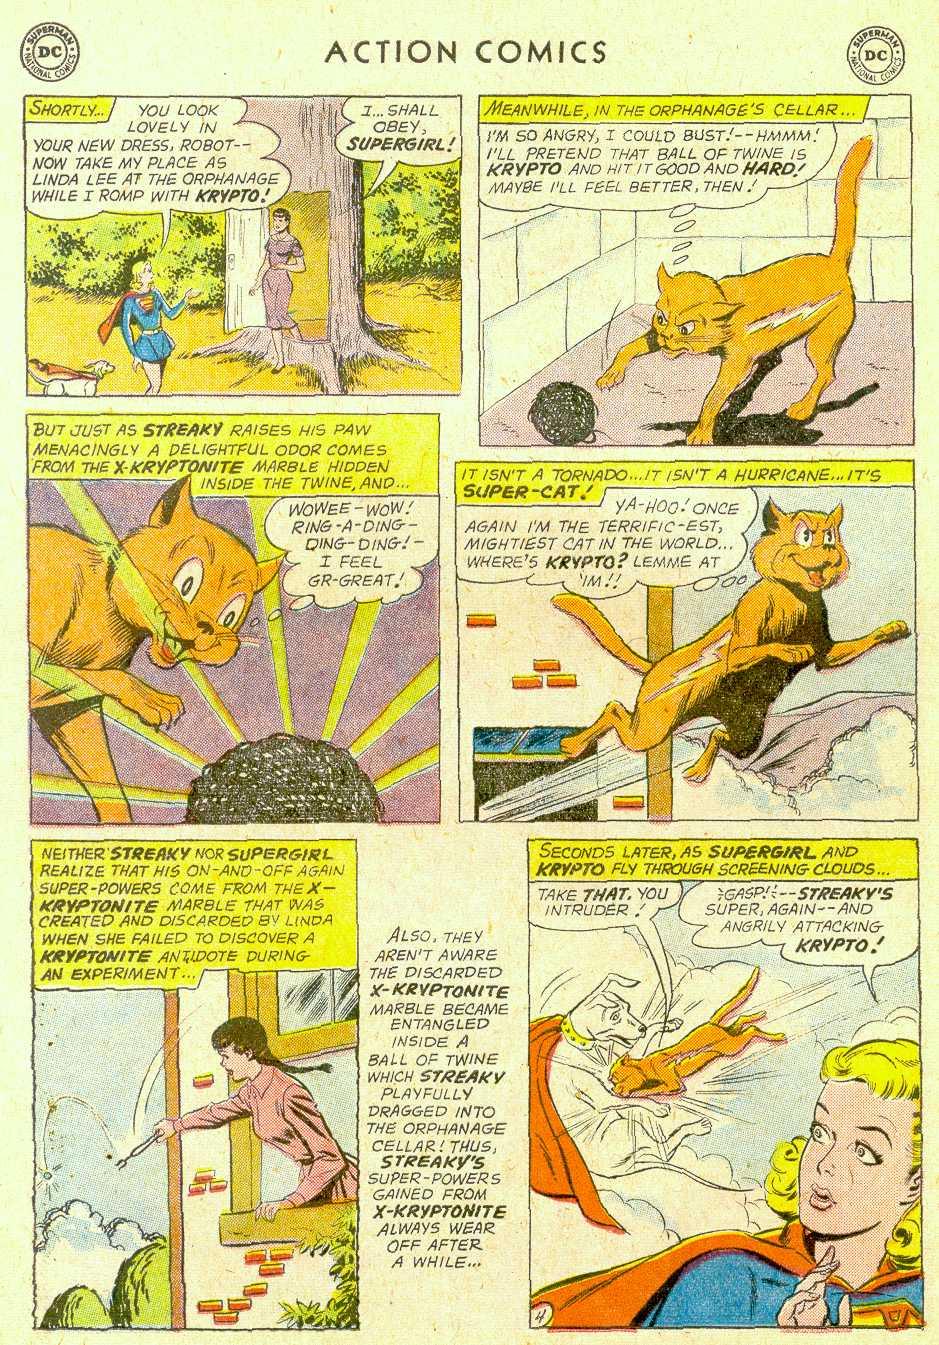 Action Comics (1938) 277 Page 21